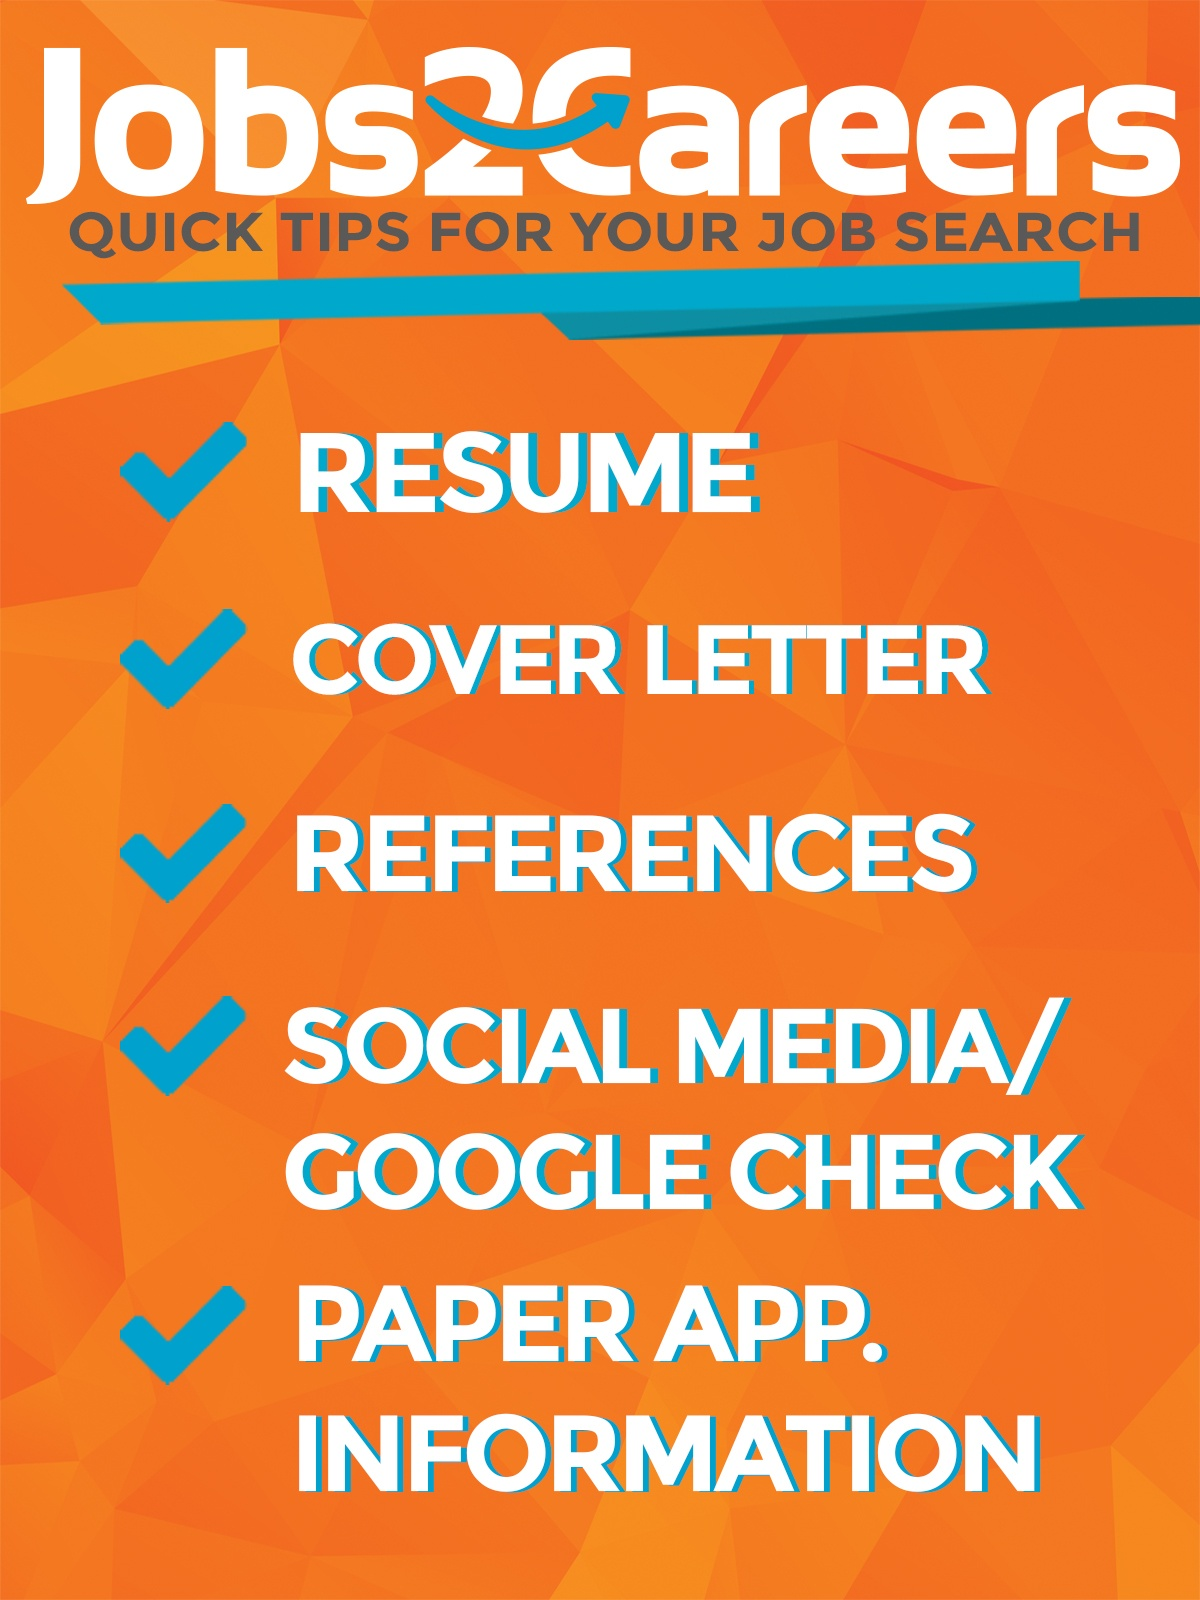 Job search tips, job search engine, Jobs2Careers